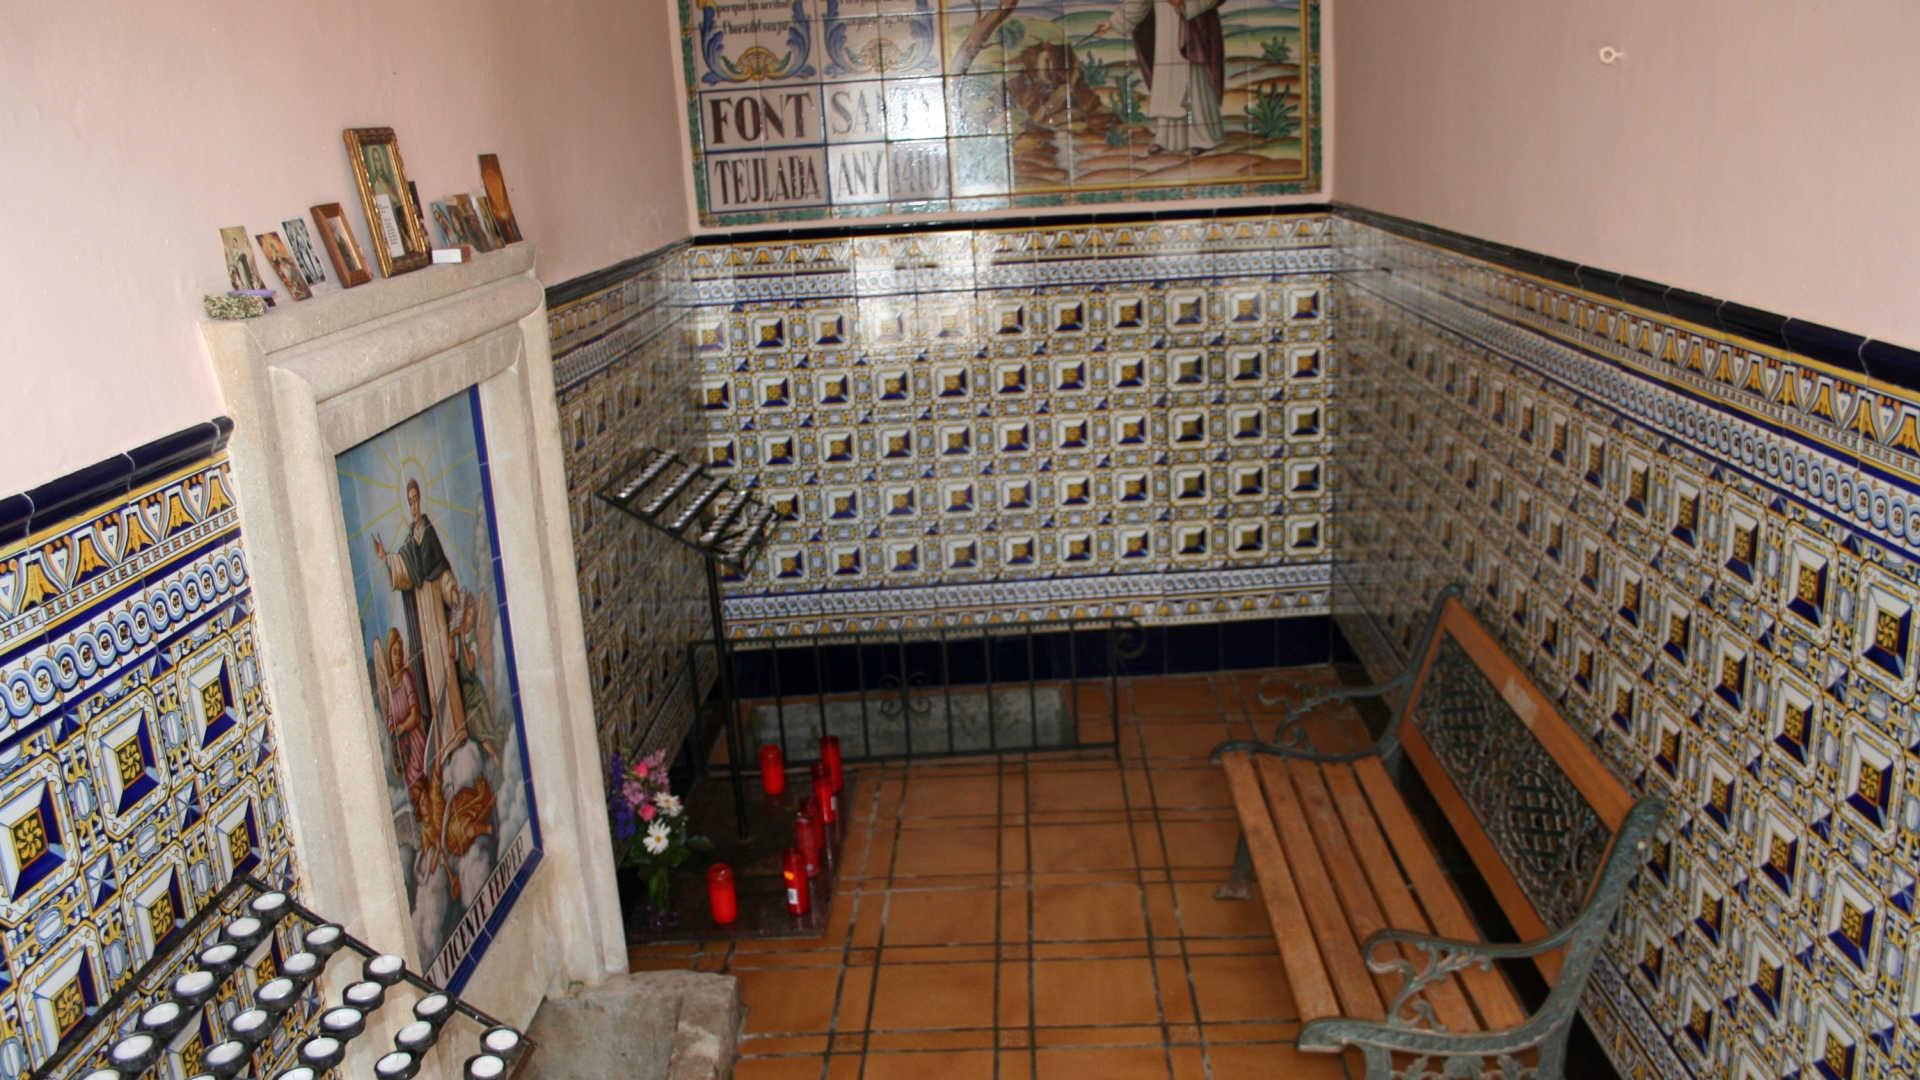 Chapelle de la Font Santa